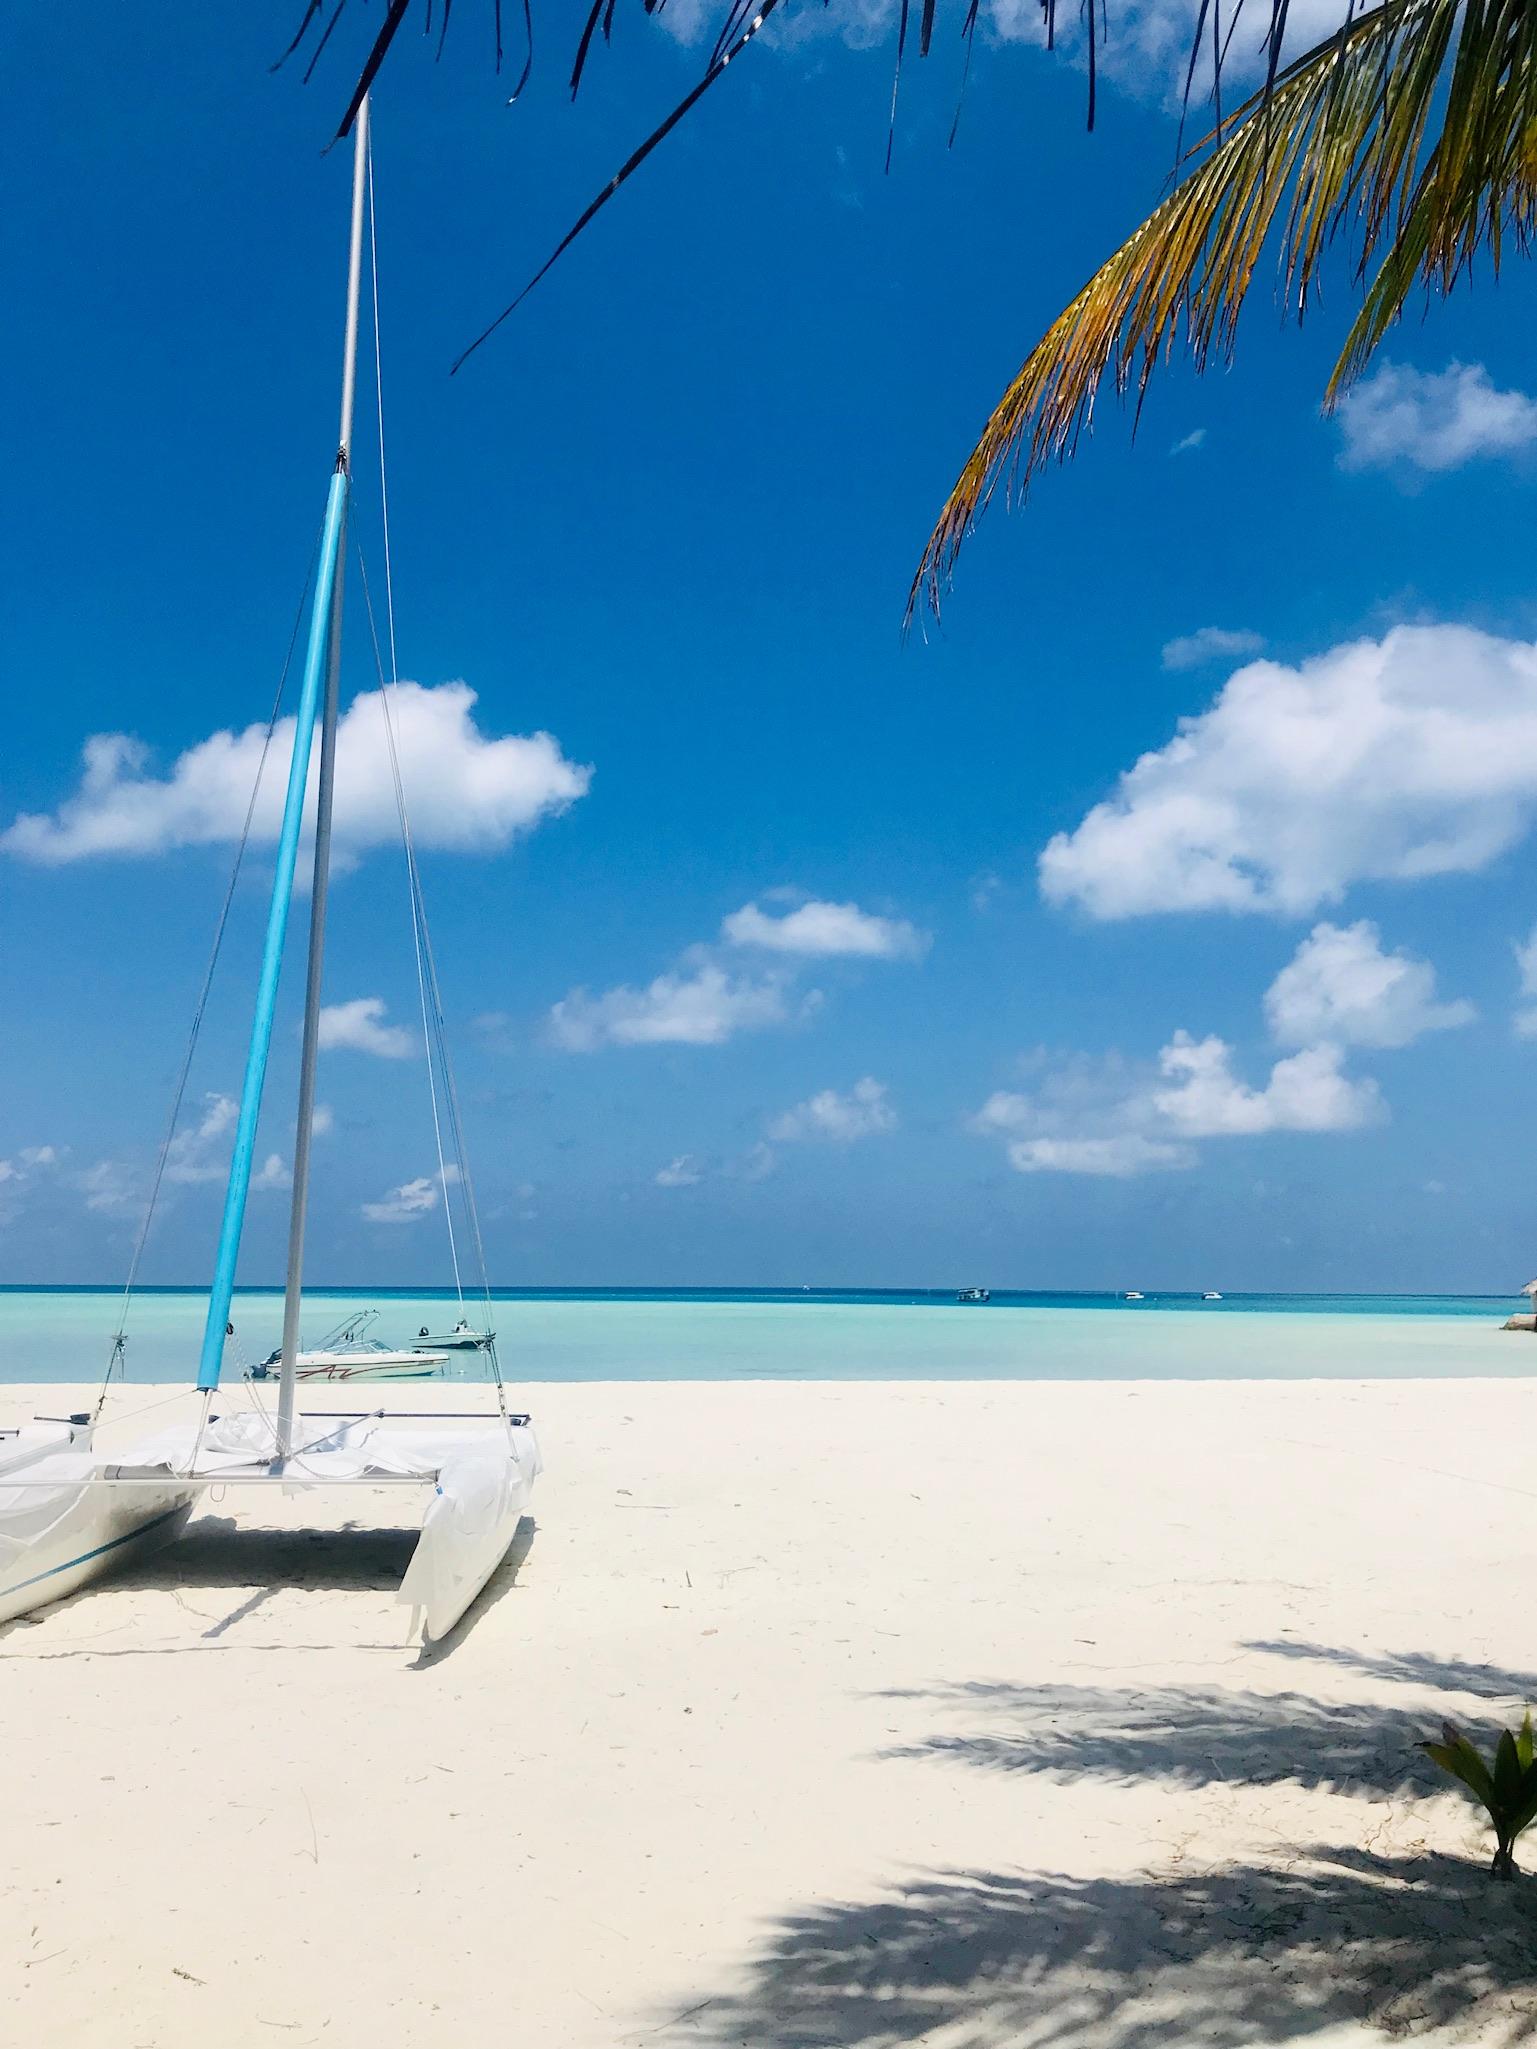 Rihiveli maldives plage catamaran